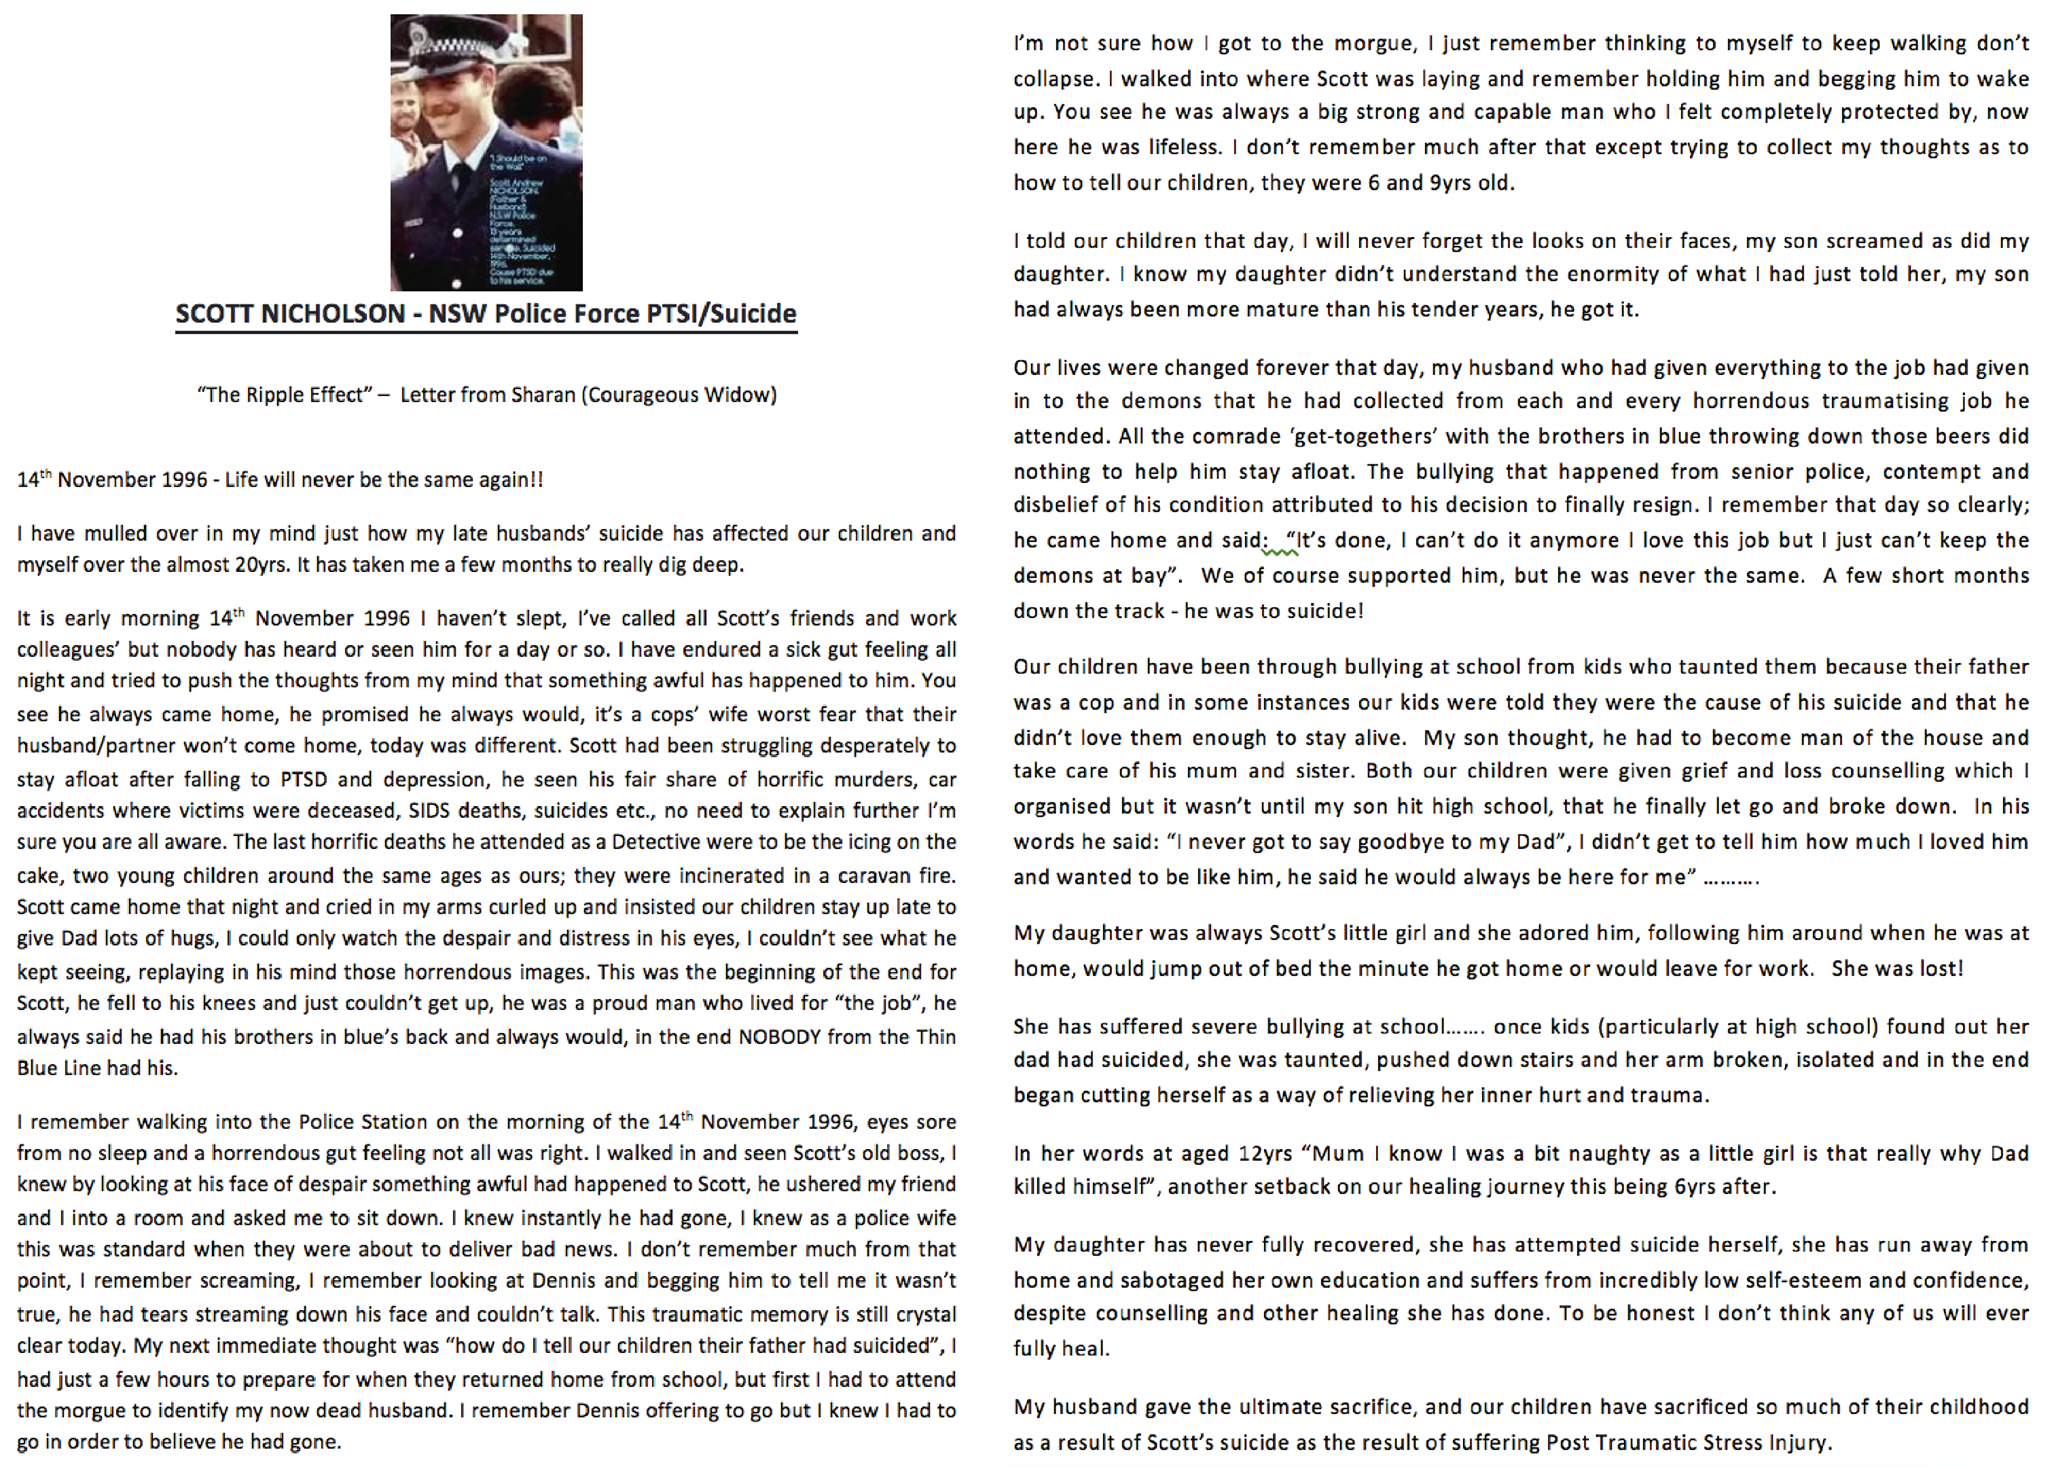 Scott Nicholson - NSW Police Force PTSI / Suicide